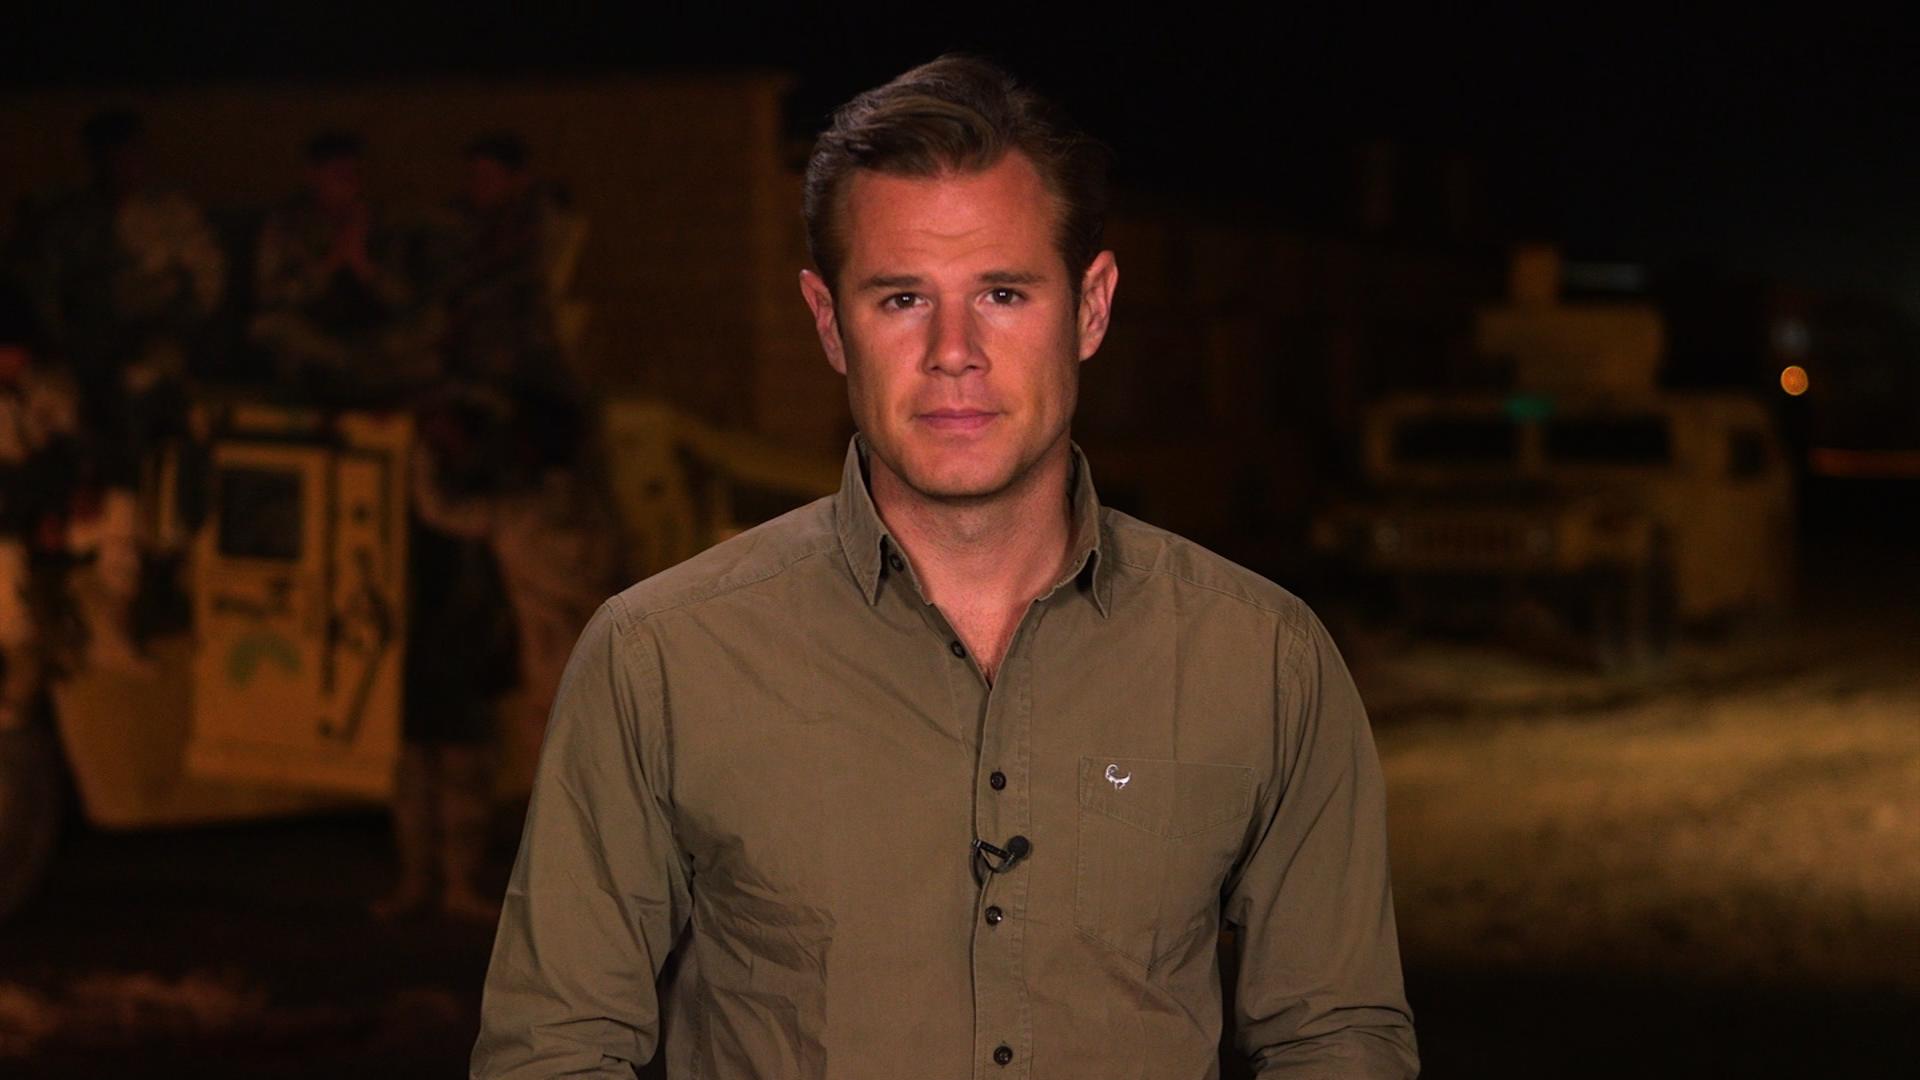 Alexander Marquardt Joins CNN As Senior National Correspondent